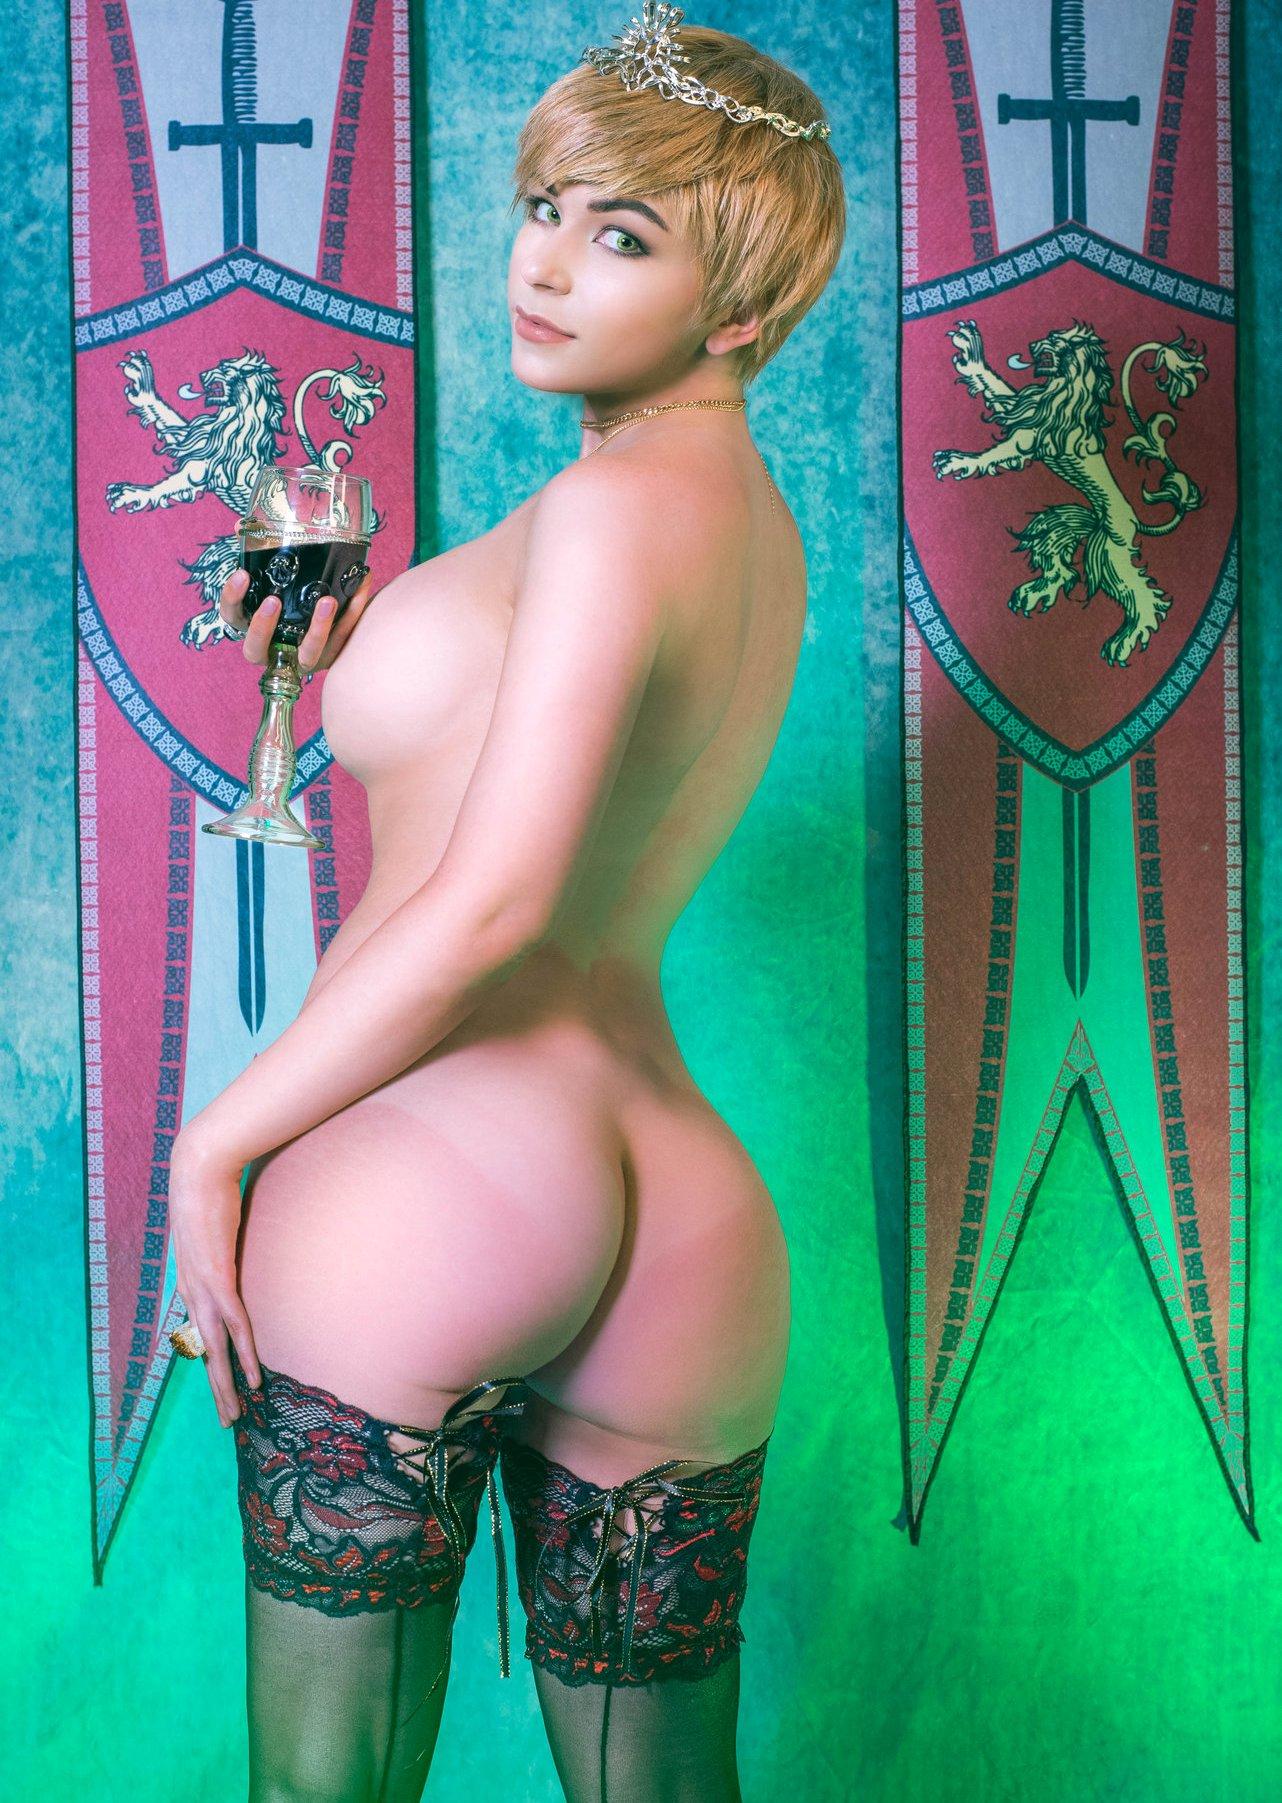 Danielle Beaulieu Daniellecosplay Onlyfans Nude Leaks 0024